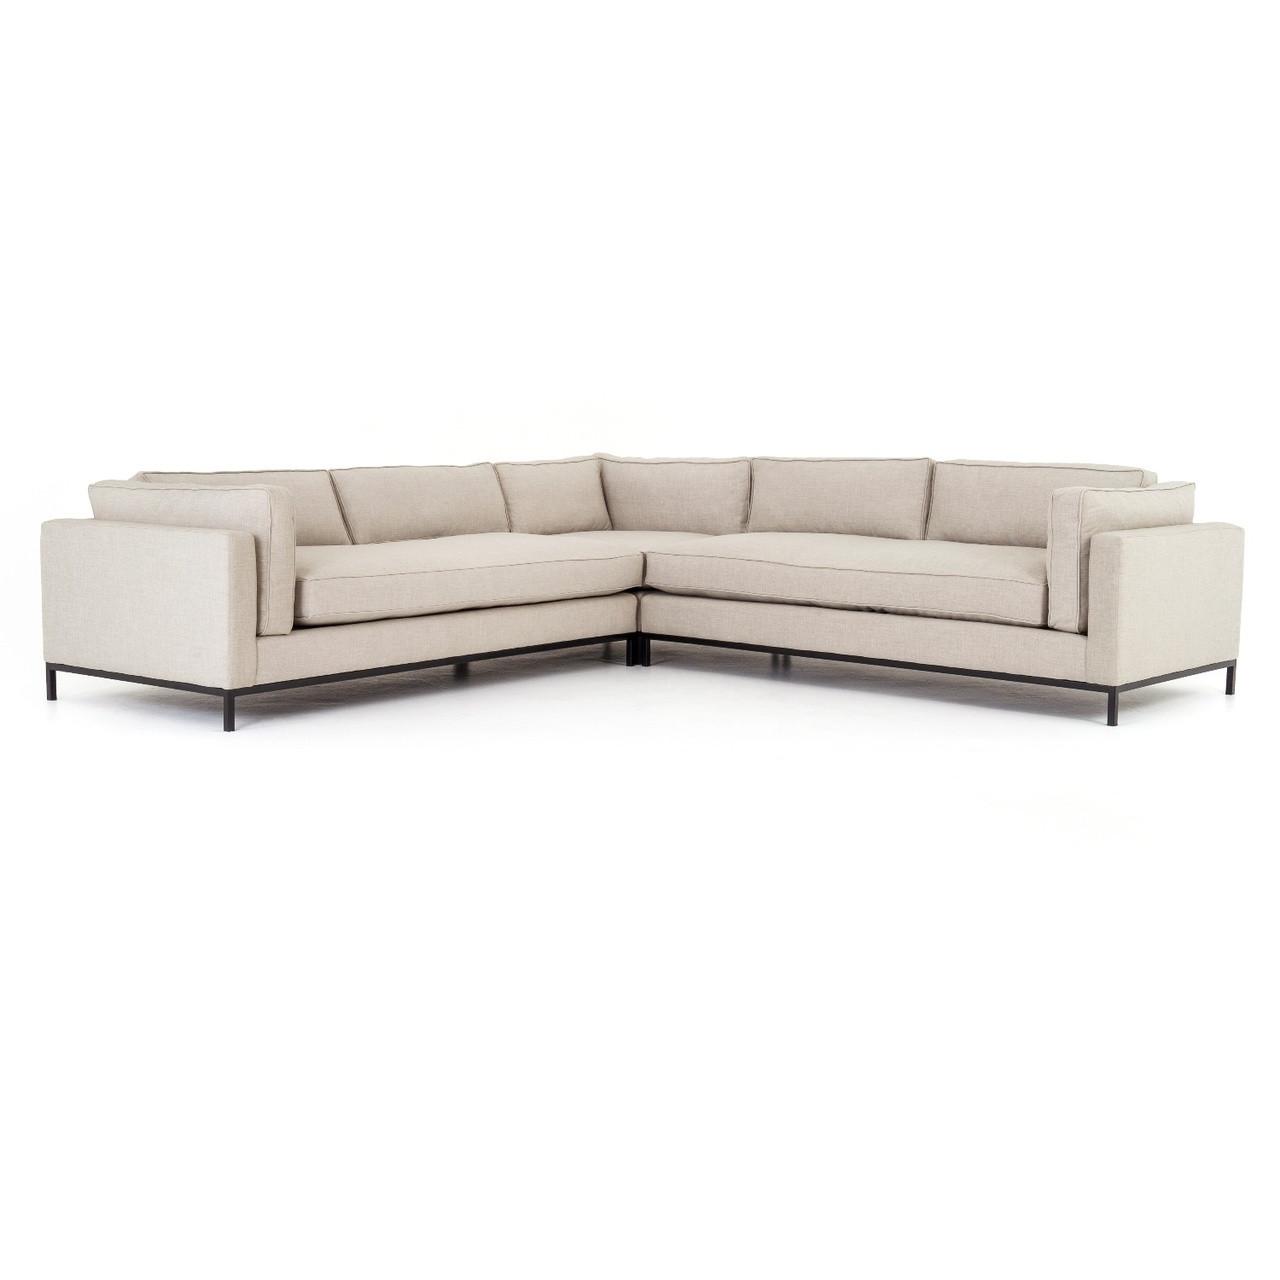 Grammercy Sand Fabric 3 Piece Corner Sectional Sofa